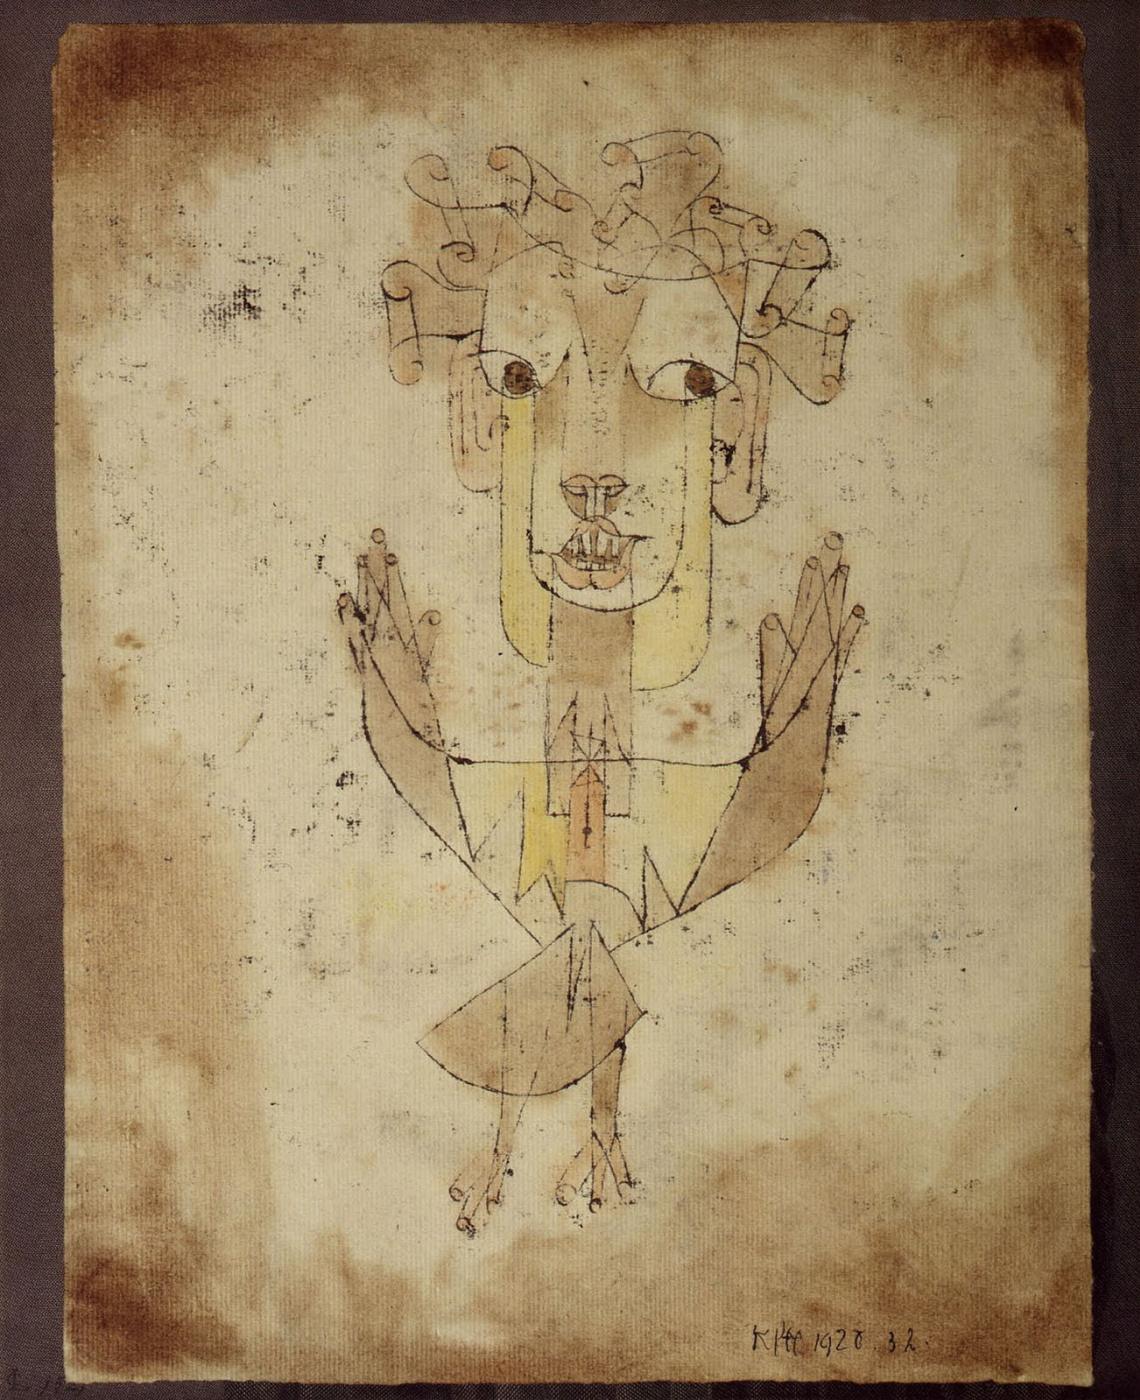 Paul Klee. New angel (Angelus Novus)